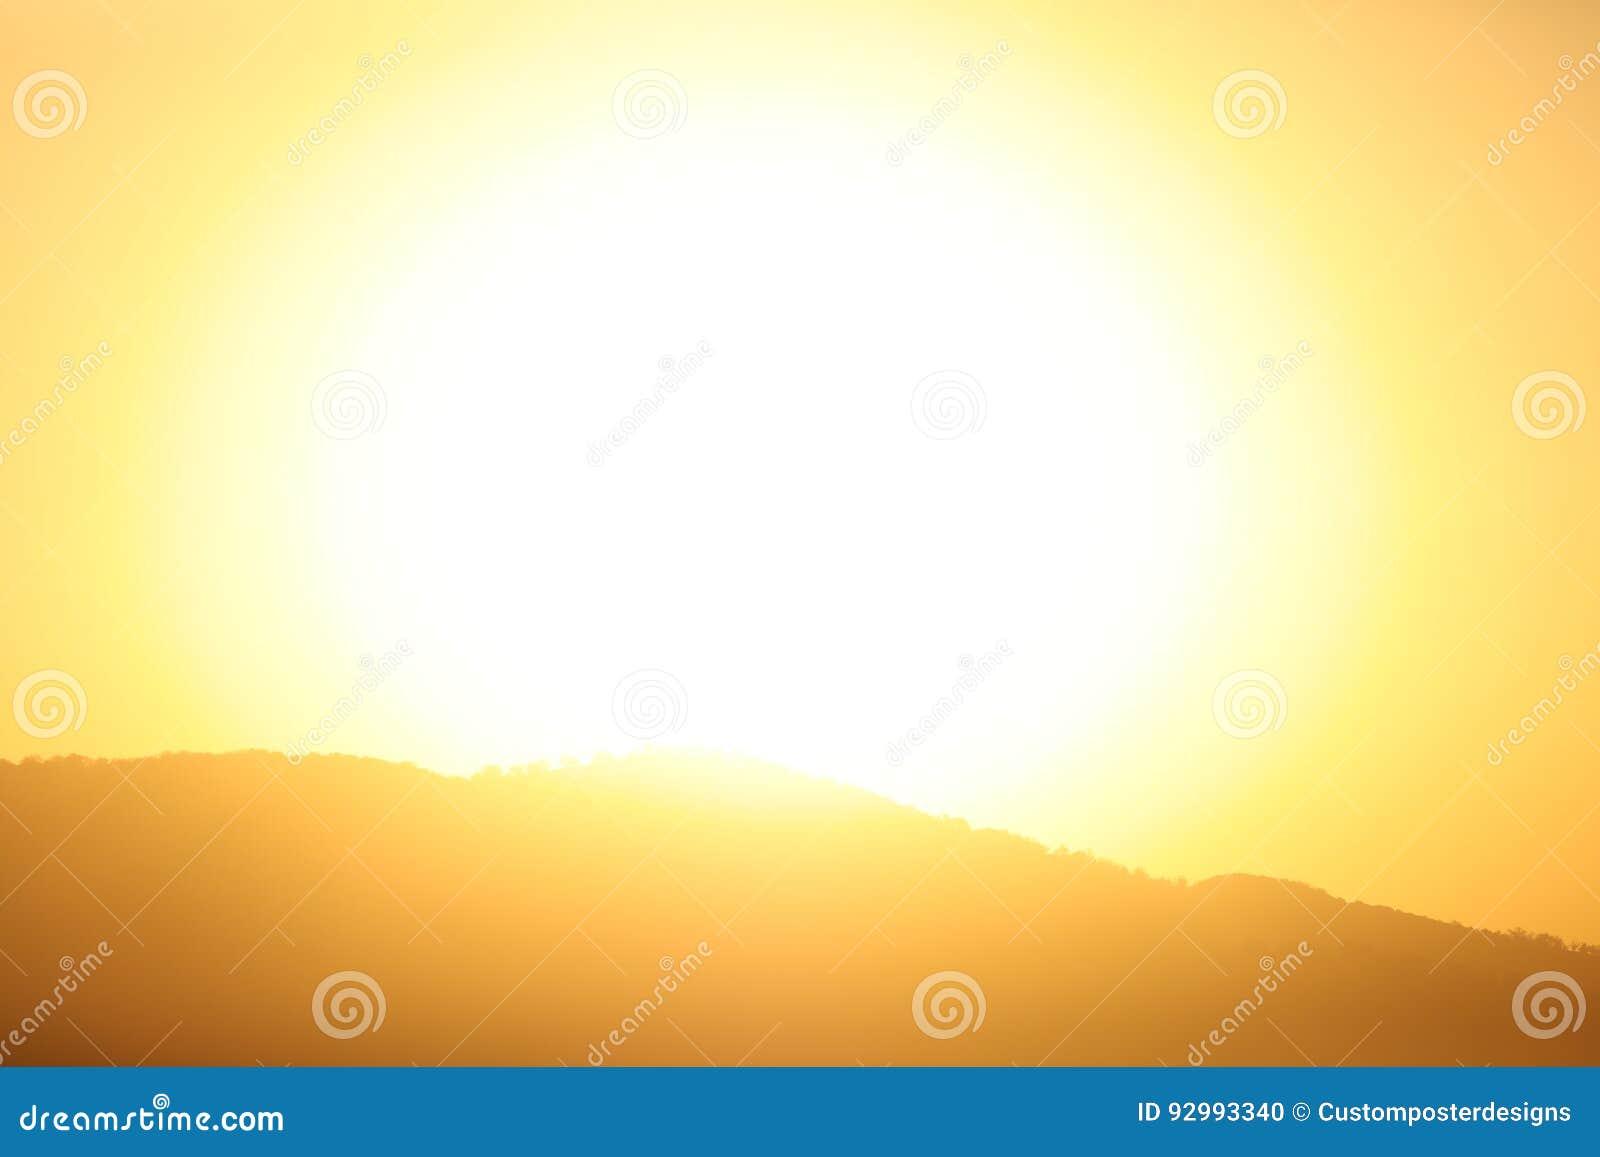 Download The blazing sun. stock photo. Image of focus, extra, desert - 92993340